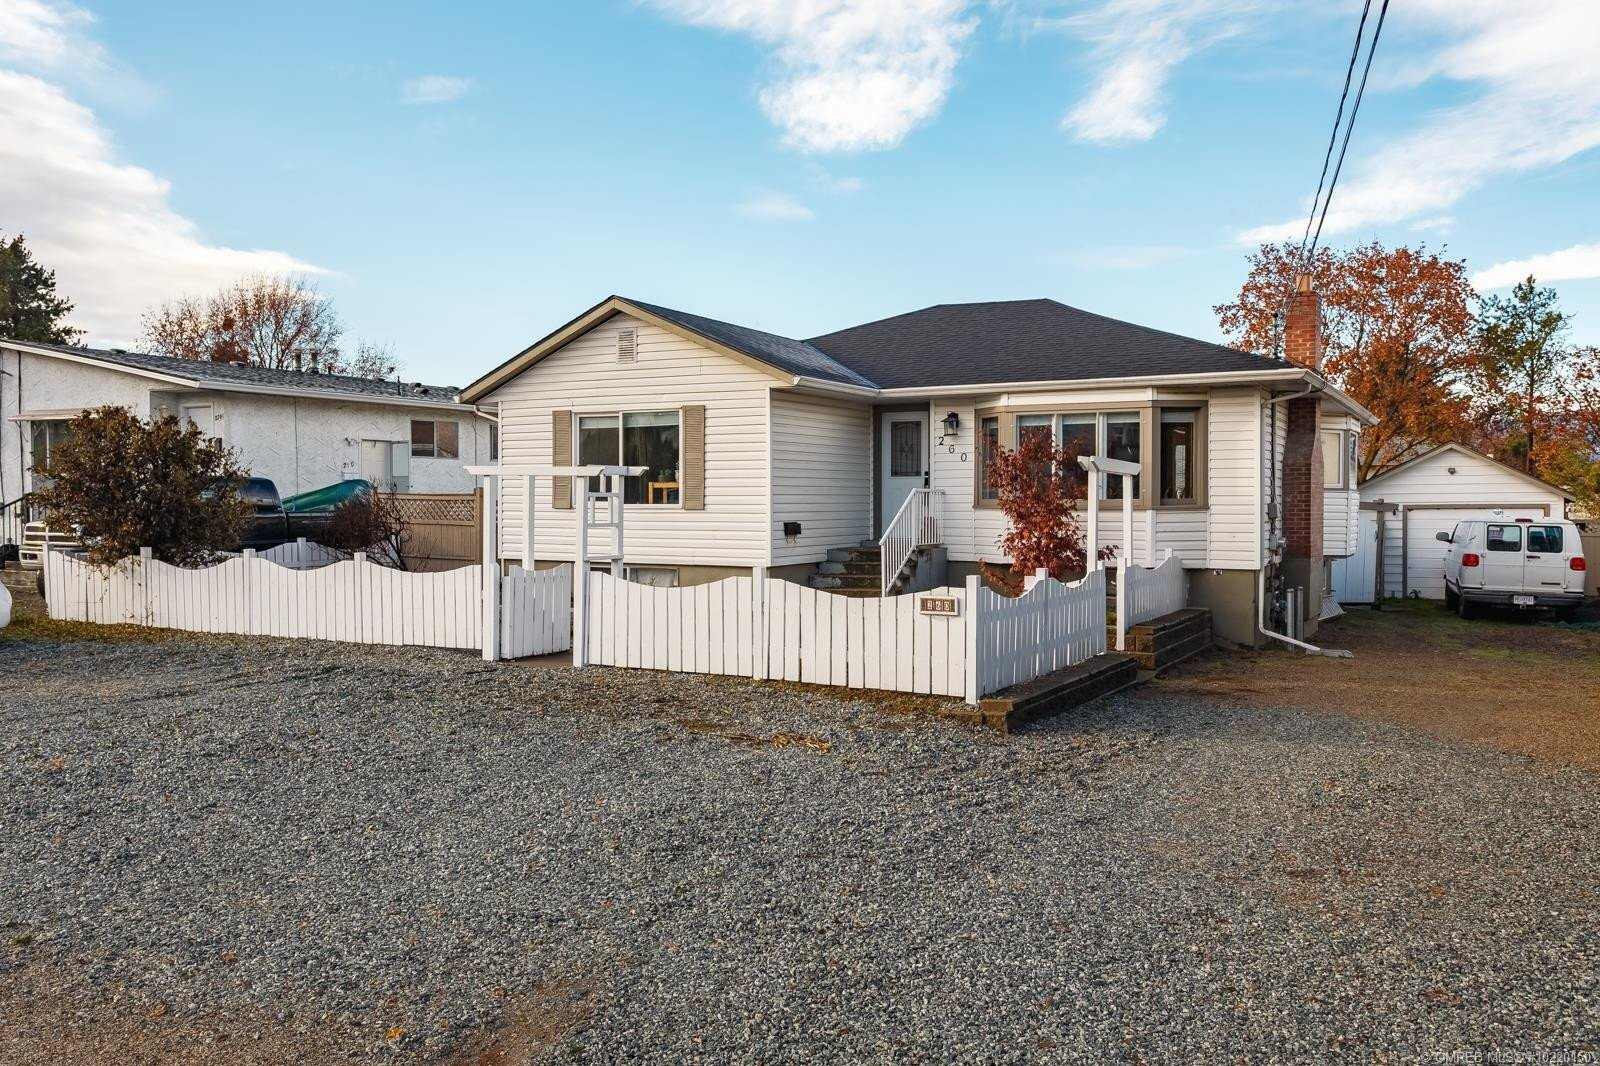 House for sale at 260 Woods Rd Kelowna British Columbia - MLS: 10220150